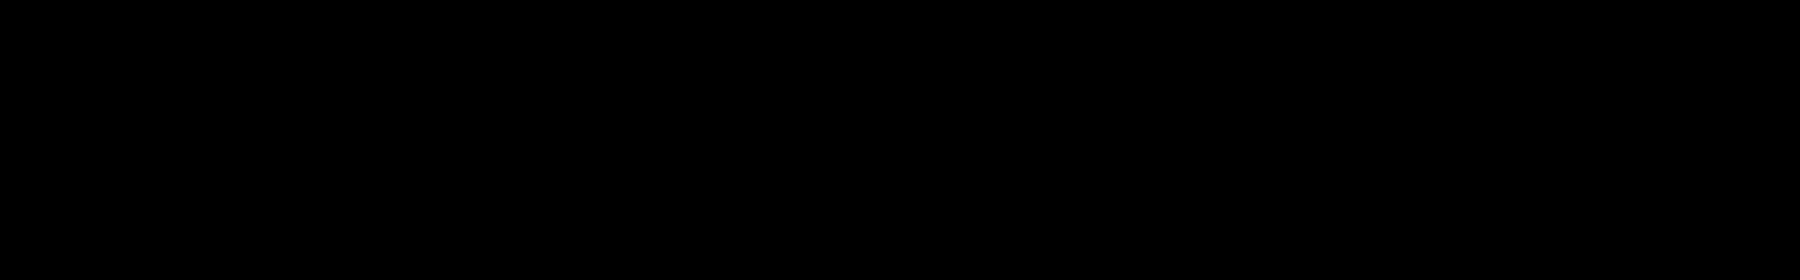 ARCADE audio waveform